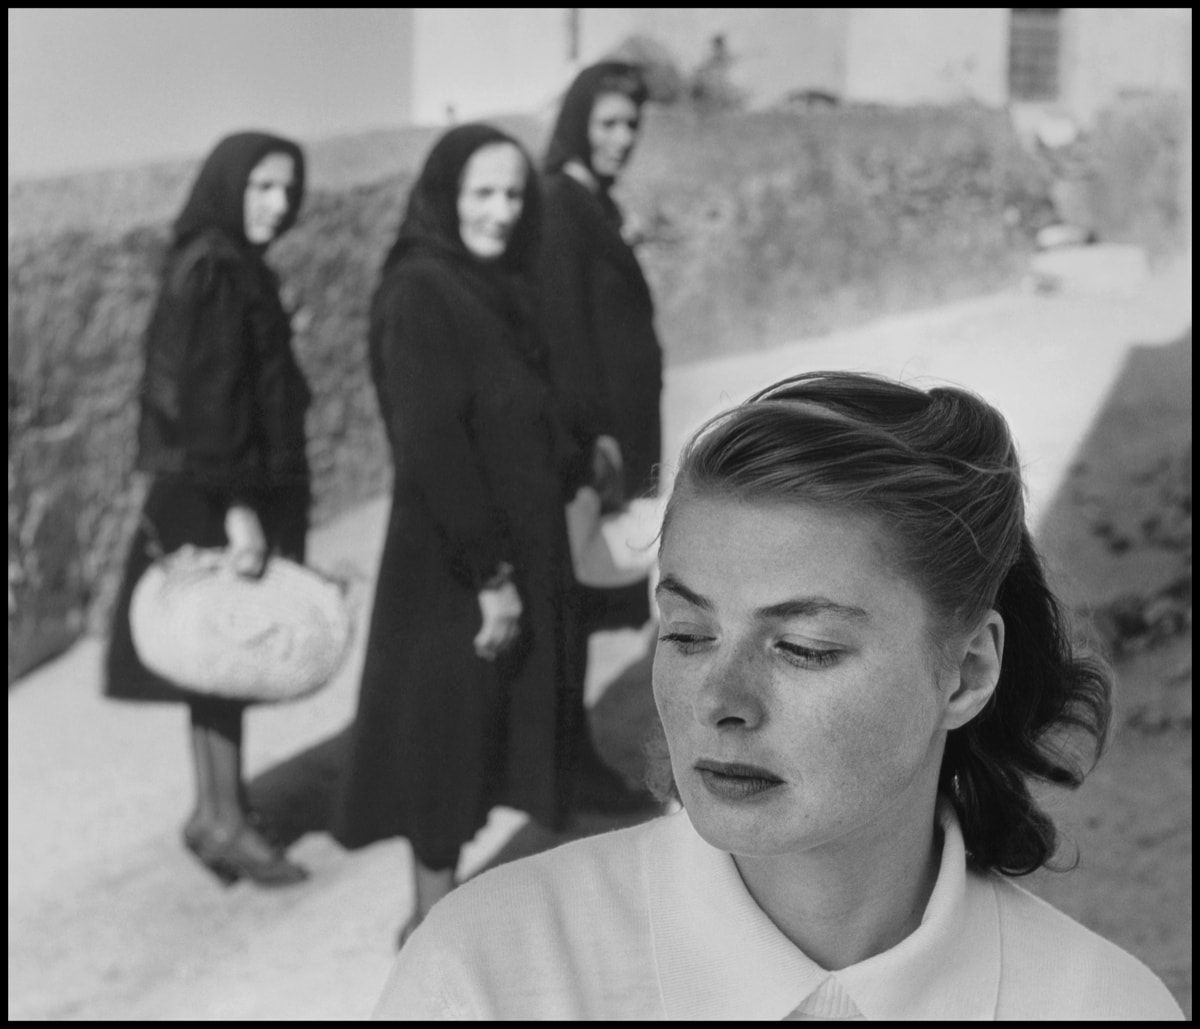 Ingrid Bergman At Stromboli Italy 1949 C Gordon Parks American Gothic